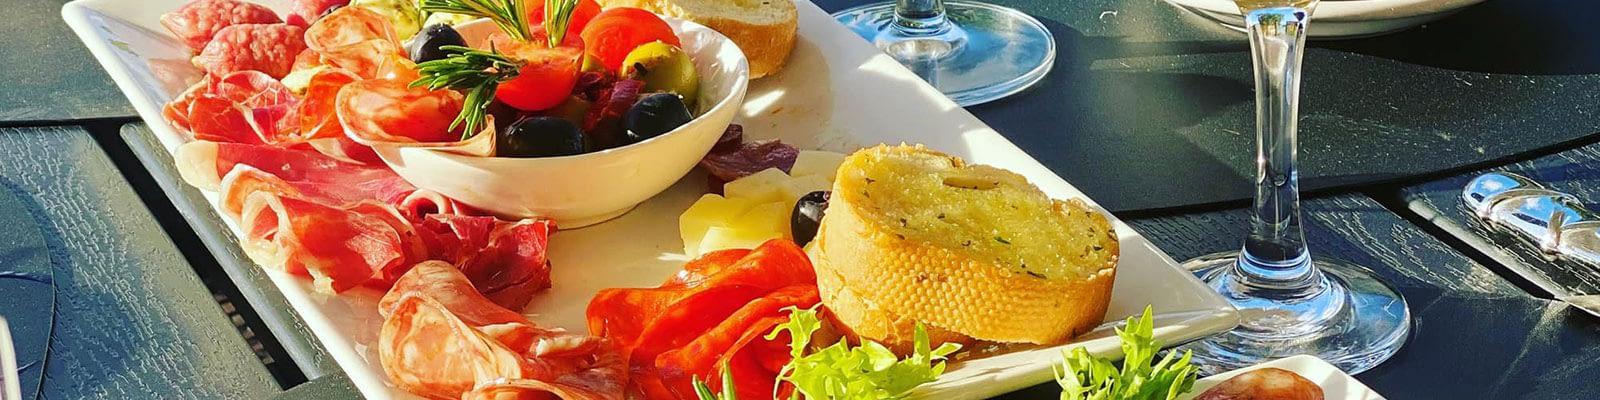 umbrella-restaurant-bonaire-slider-image-4